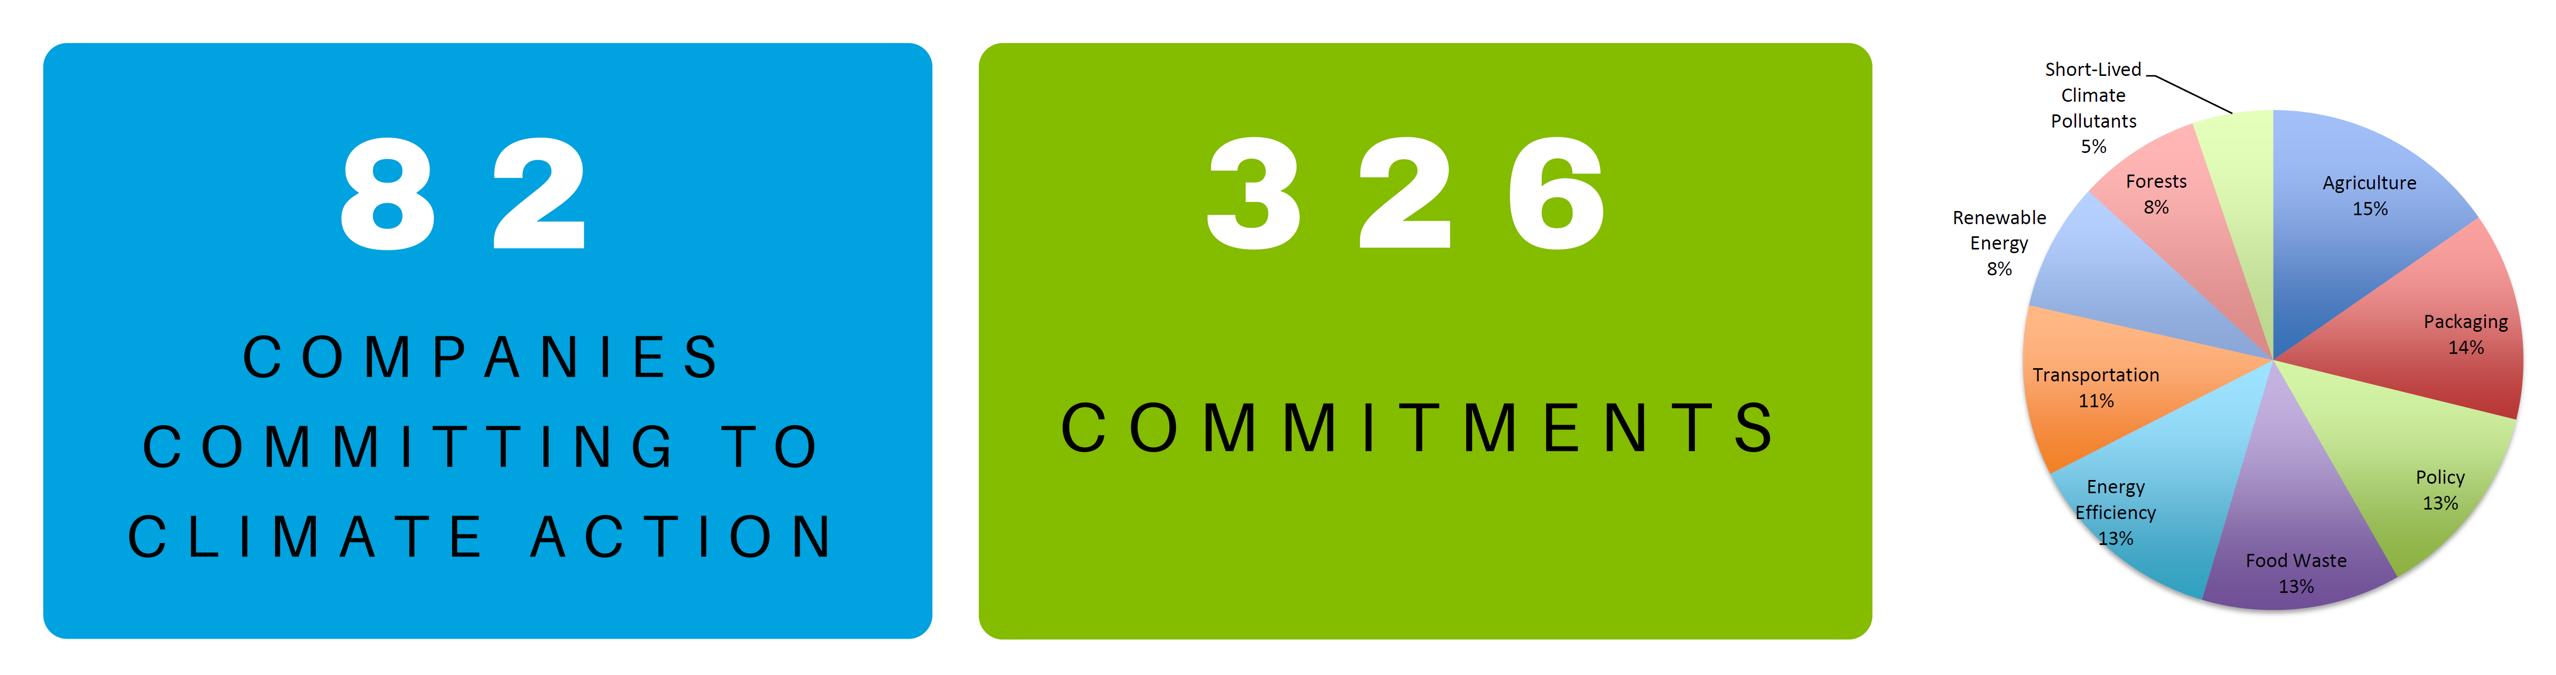 commitmentswchart.PNG